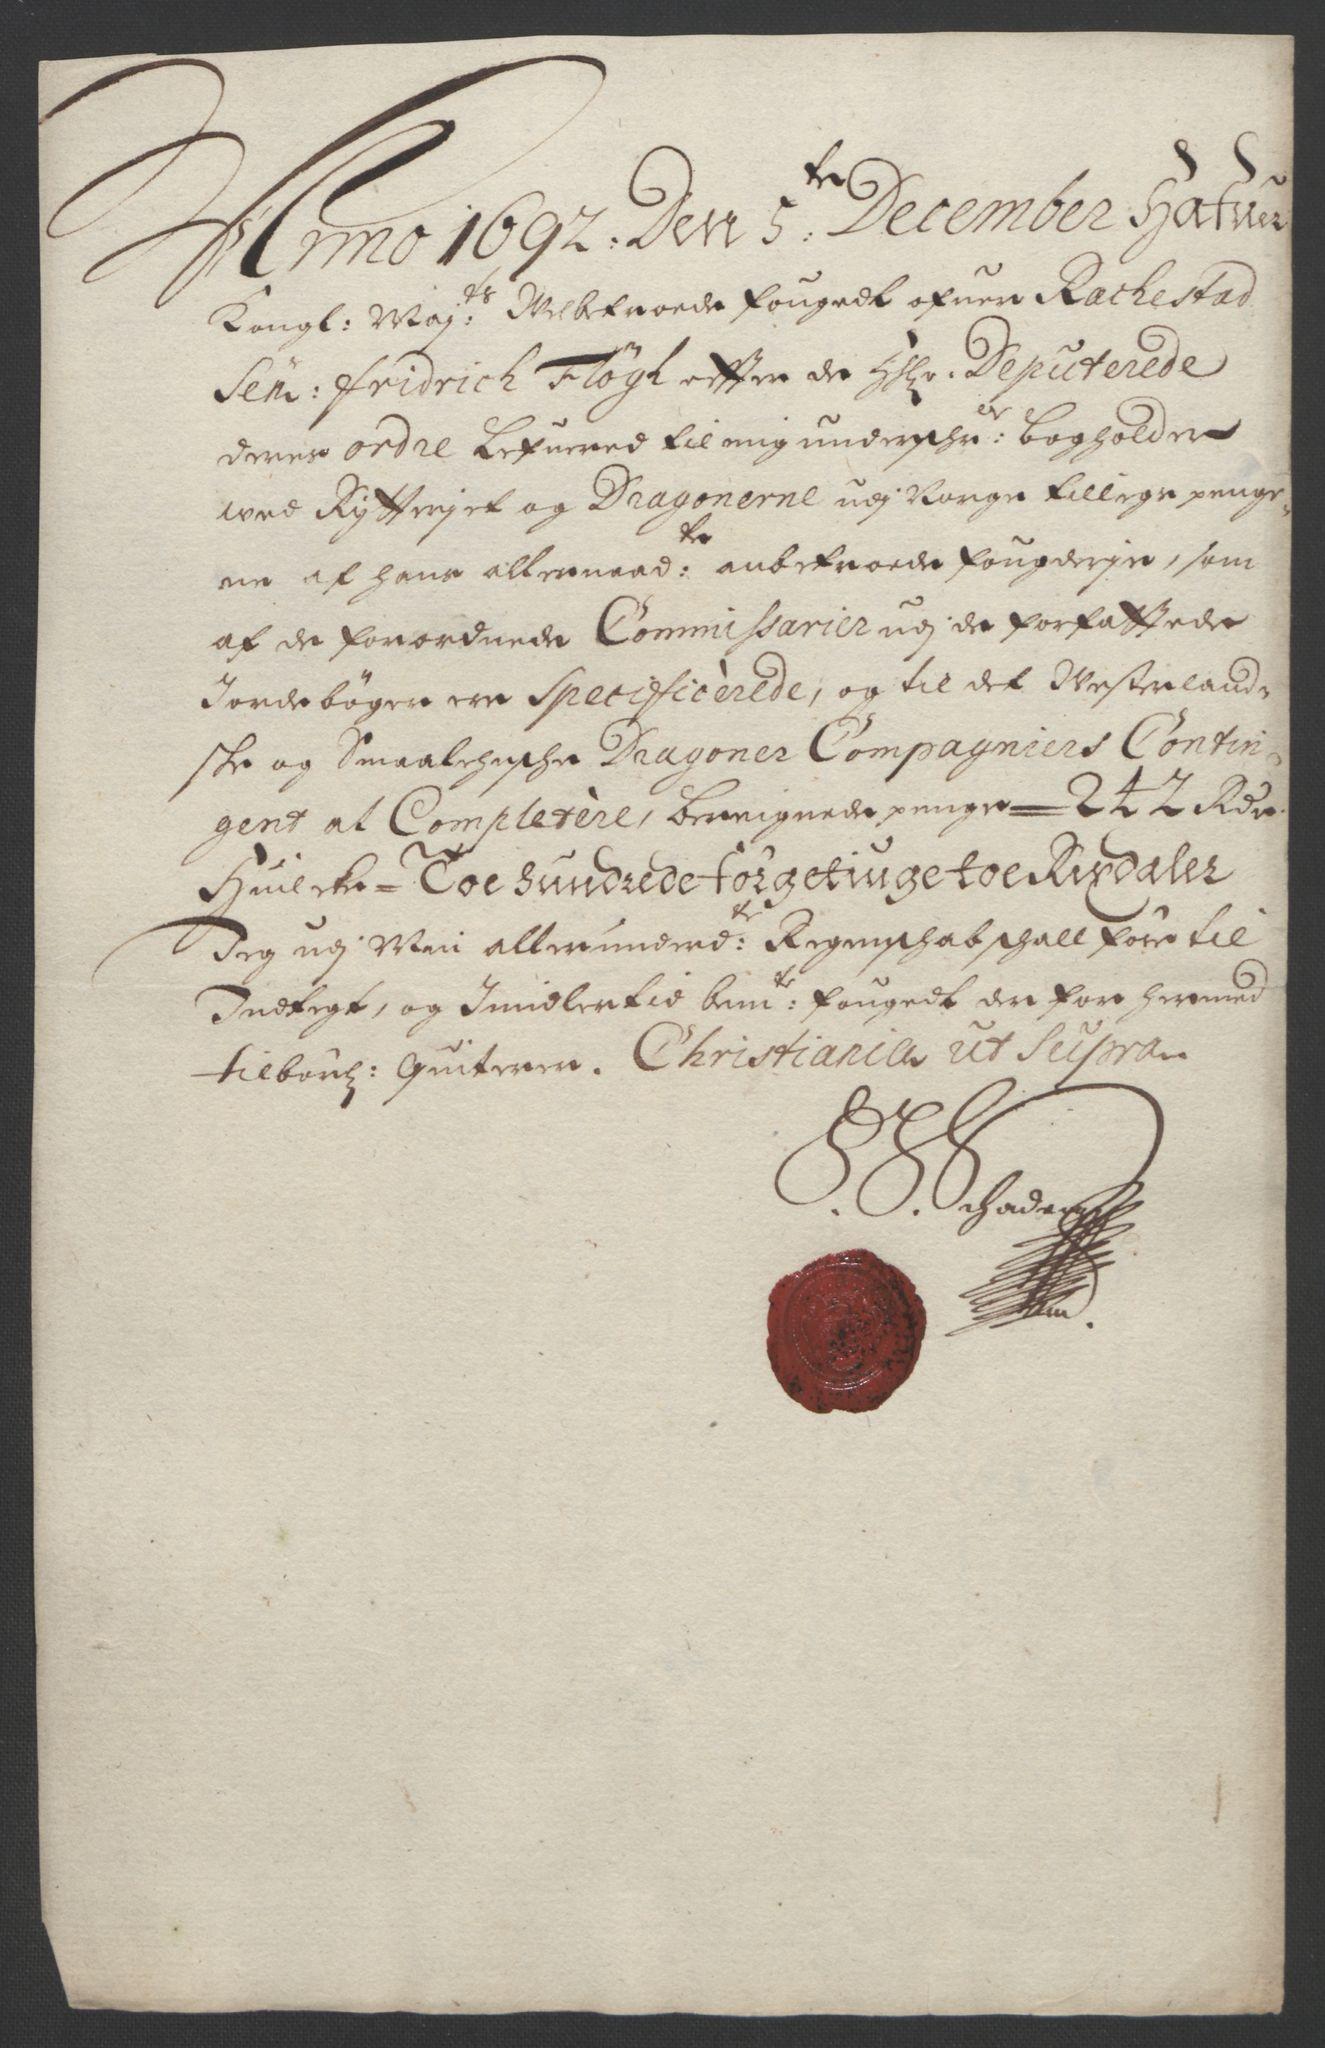 RA, Rentekammeret inntil 1814, Reviderte regnskaper, Fogderegnskap, R05/L0278: Fogderegnskap Rakkestad, 1691-1693, s. 336